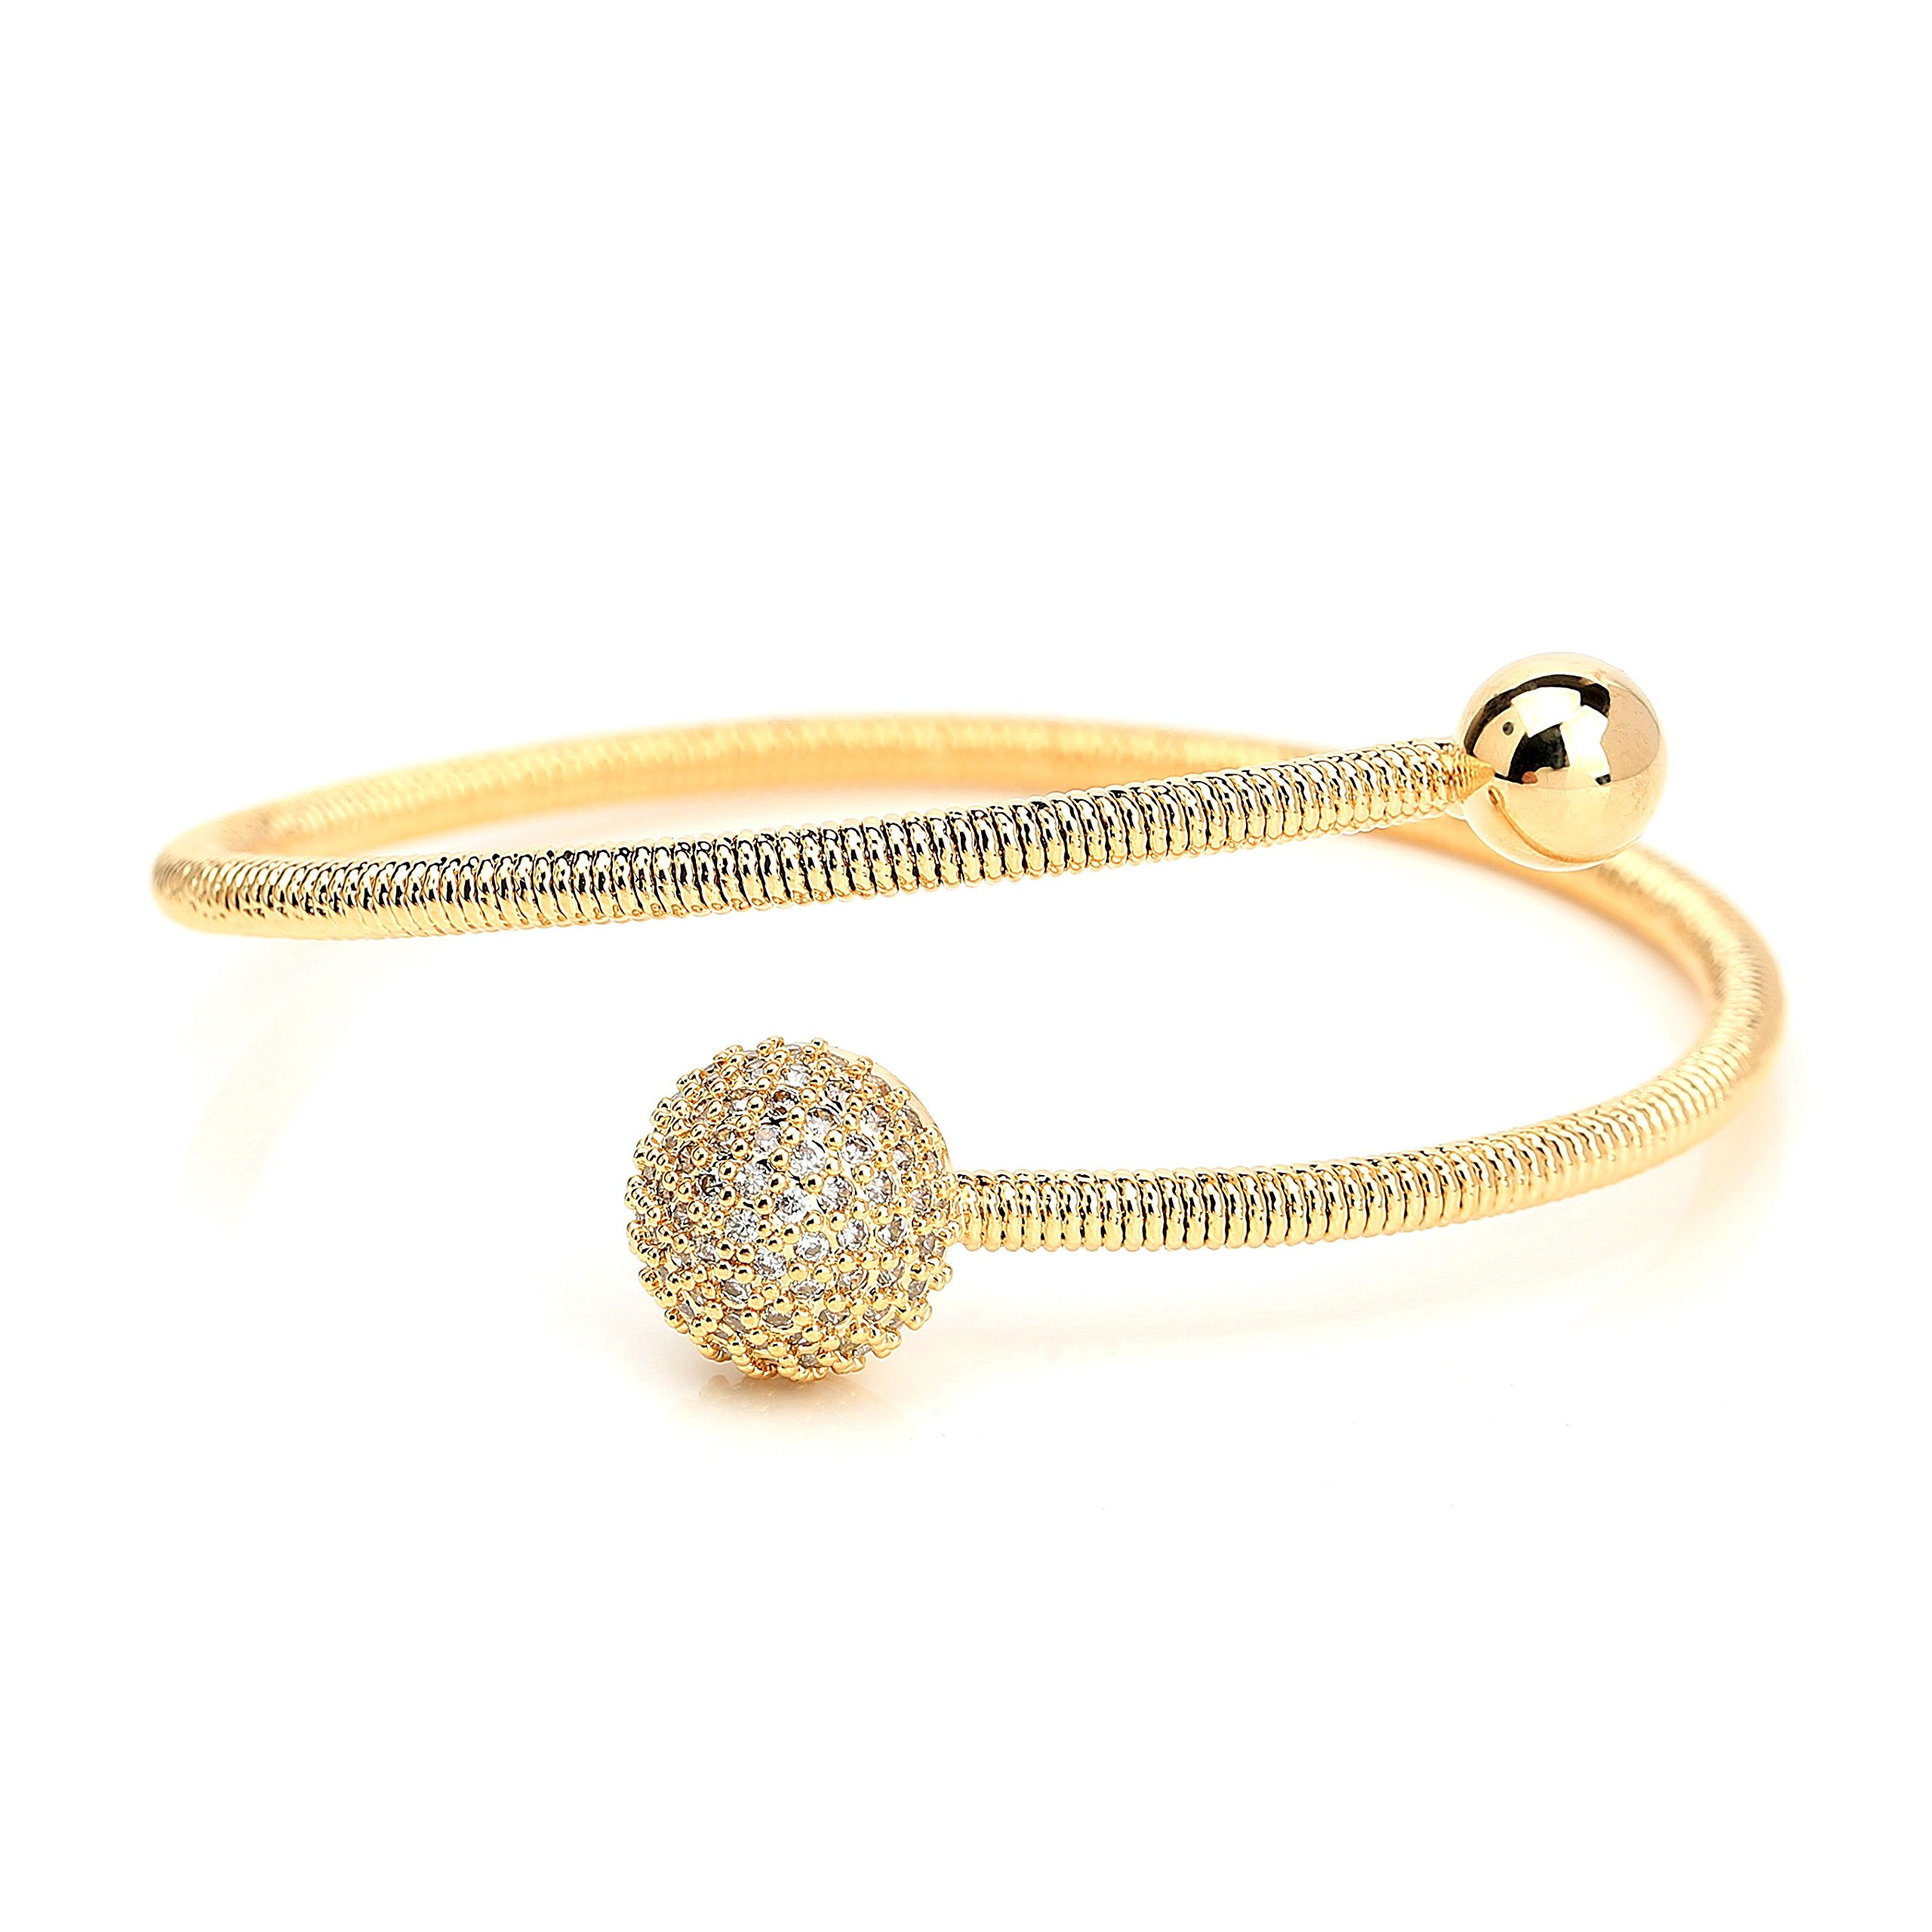 United Elegance Stylish Designer Wrap Bangle Bracelet with Sparkling Swarovski Style Crystals